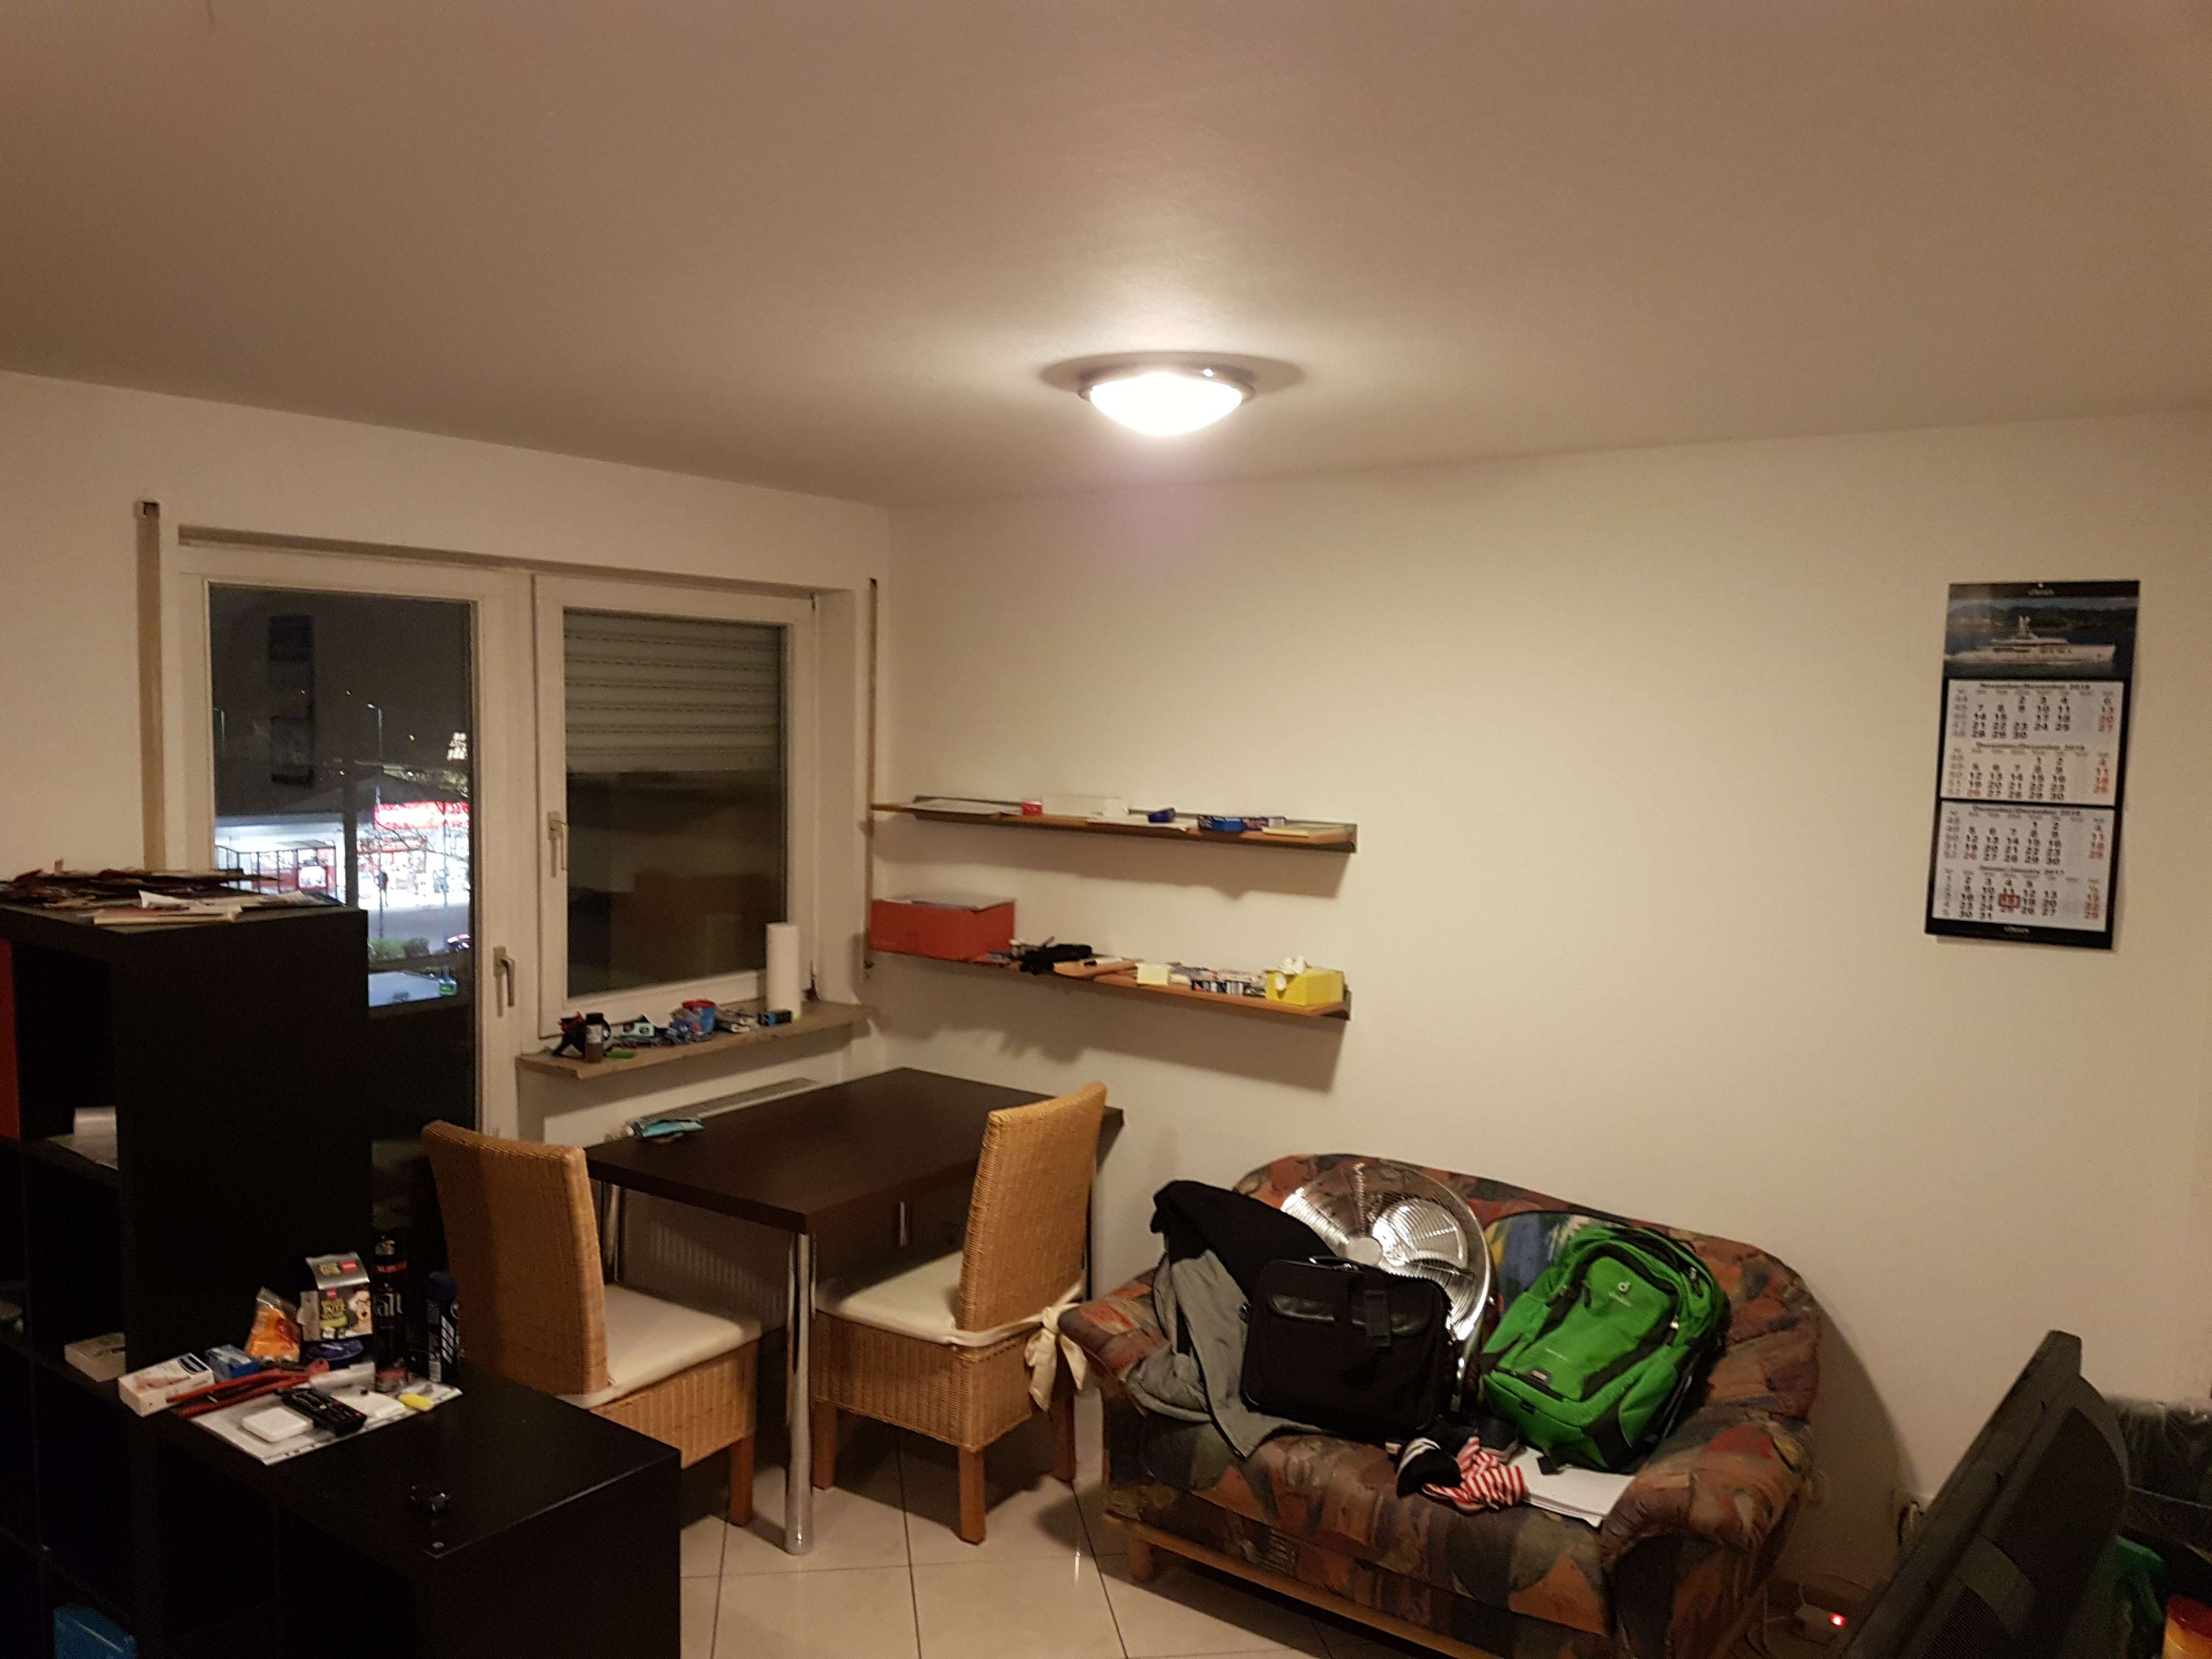 1-Zimmer-Wohnung mit Balkon in Nürnberg-Maxfeld in Maxfeld (Nürnberg)